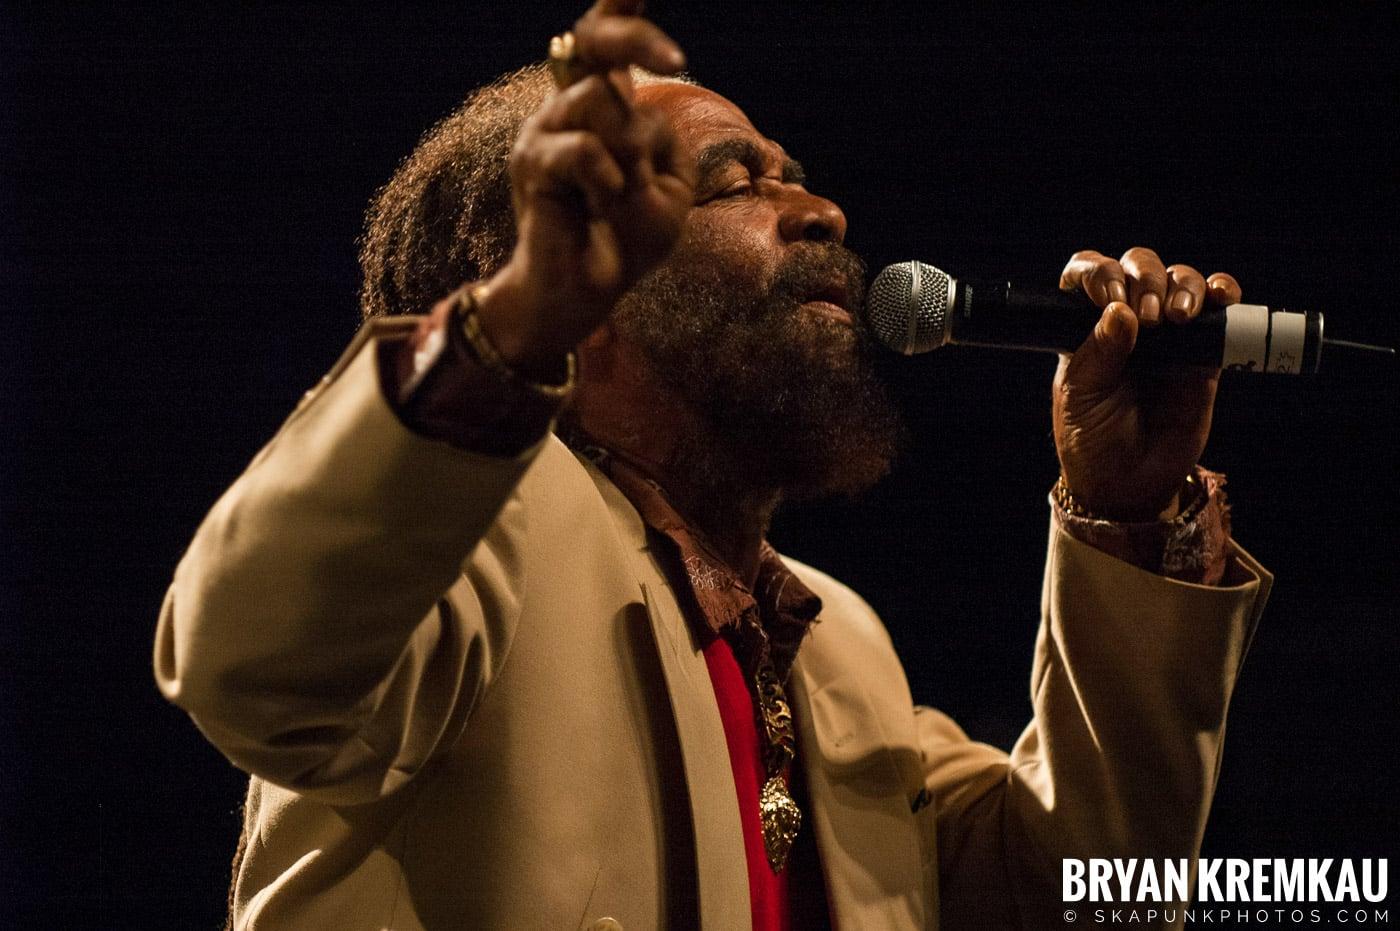 John Holt @ Vintage Reggae Fest - Hammerstein Ballroom, NYC - 12.16.07 (9)